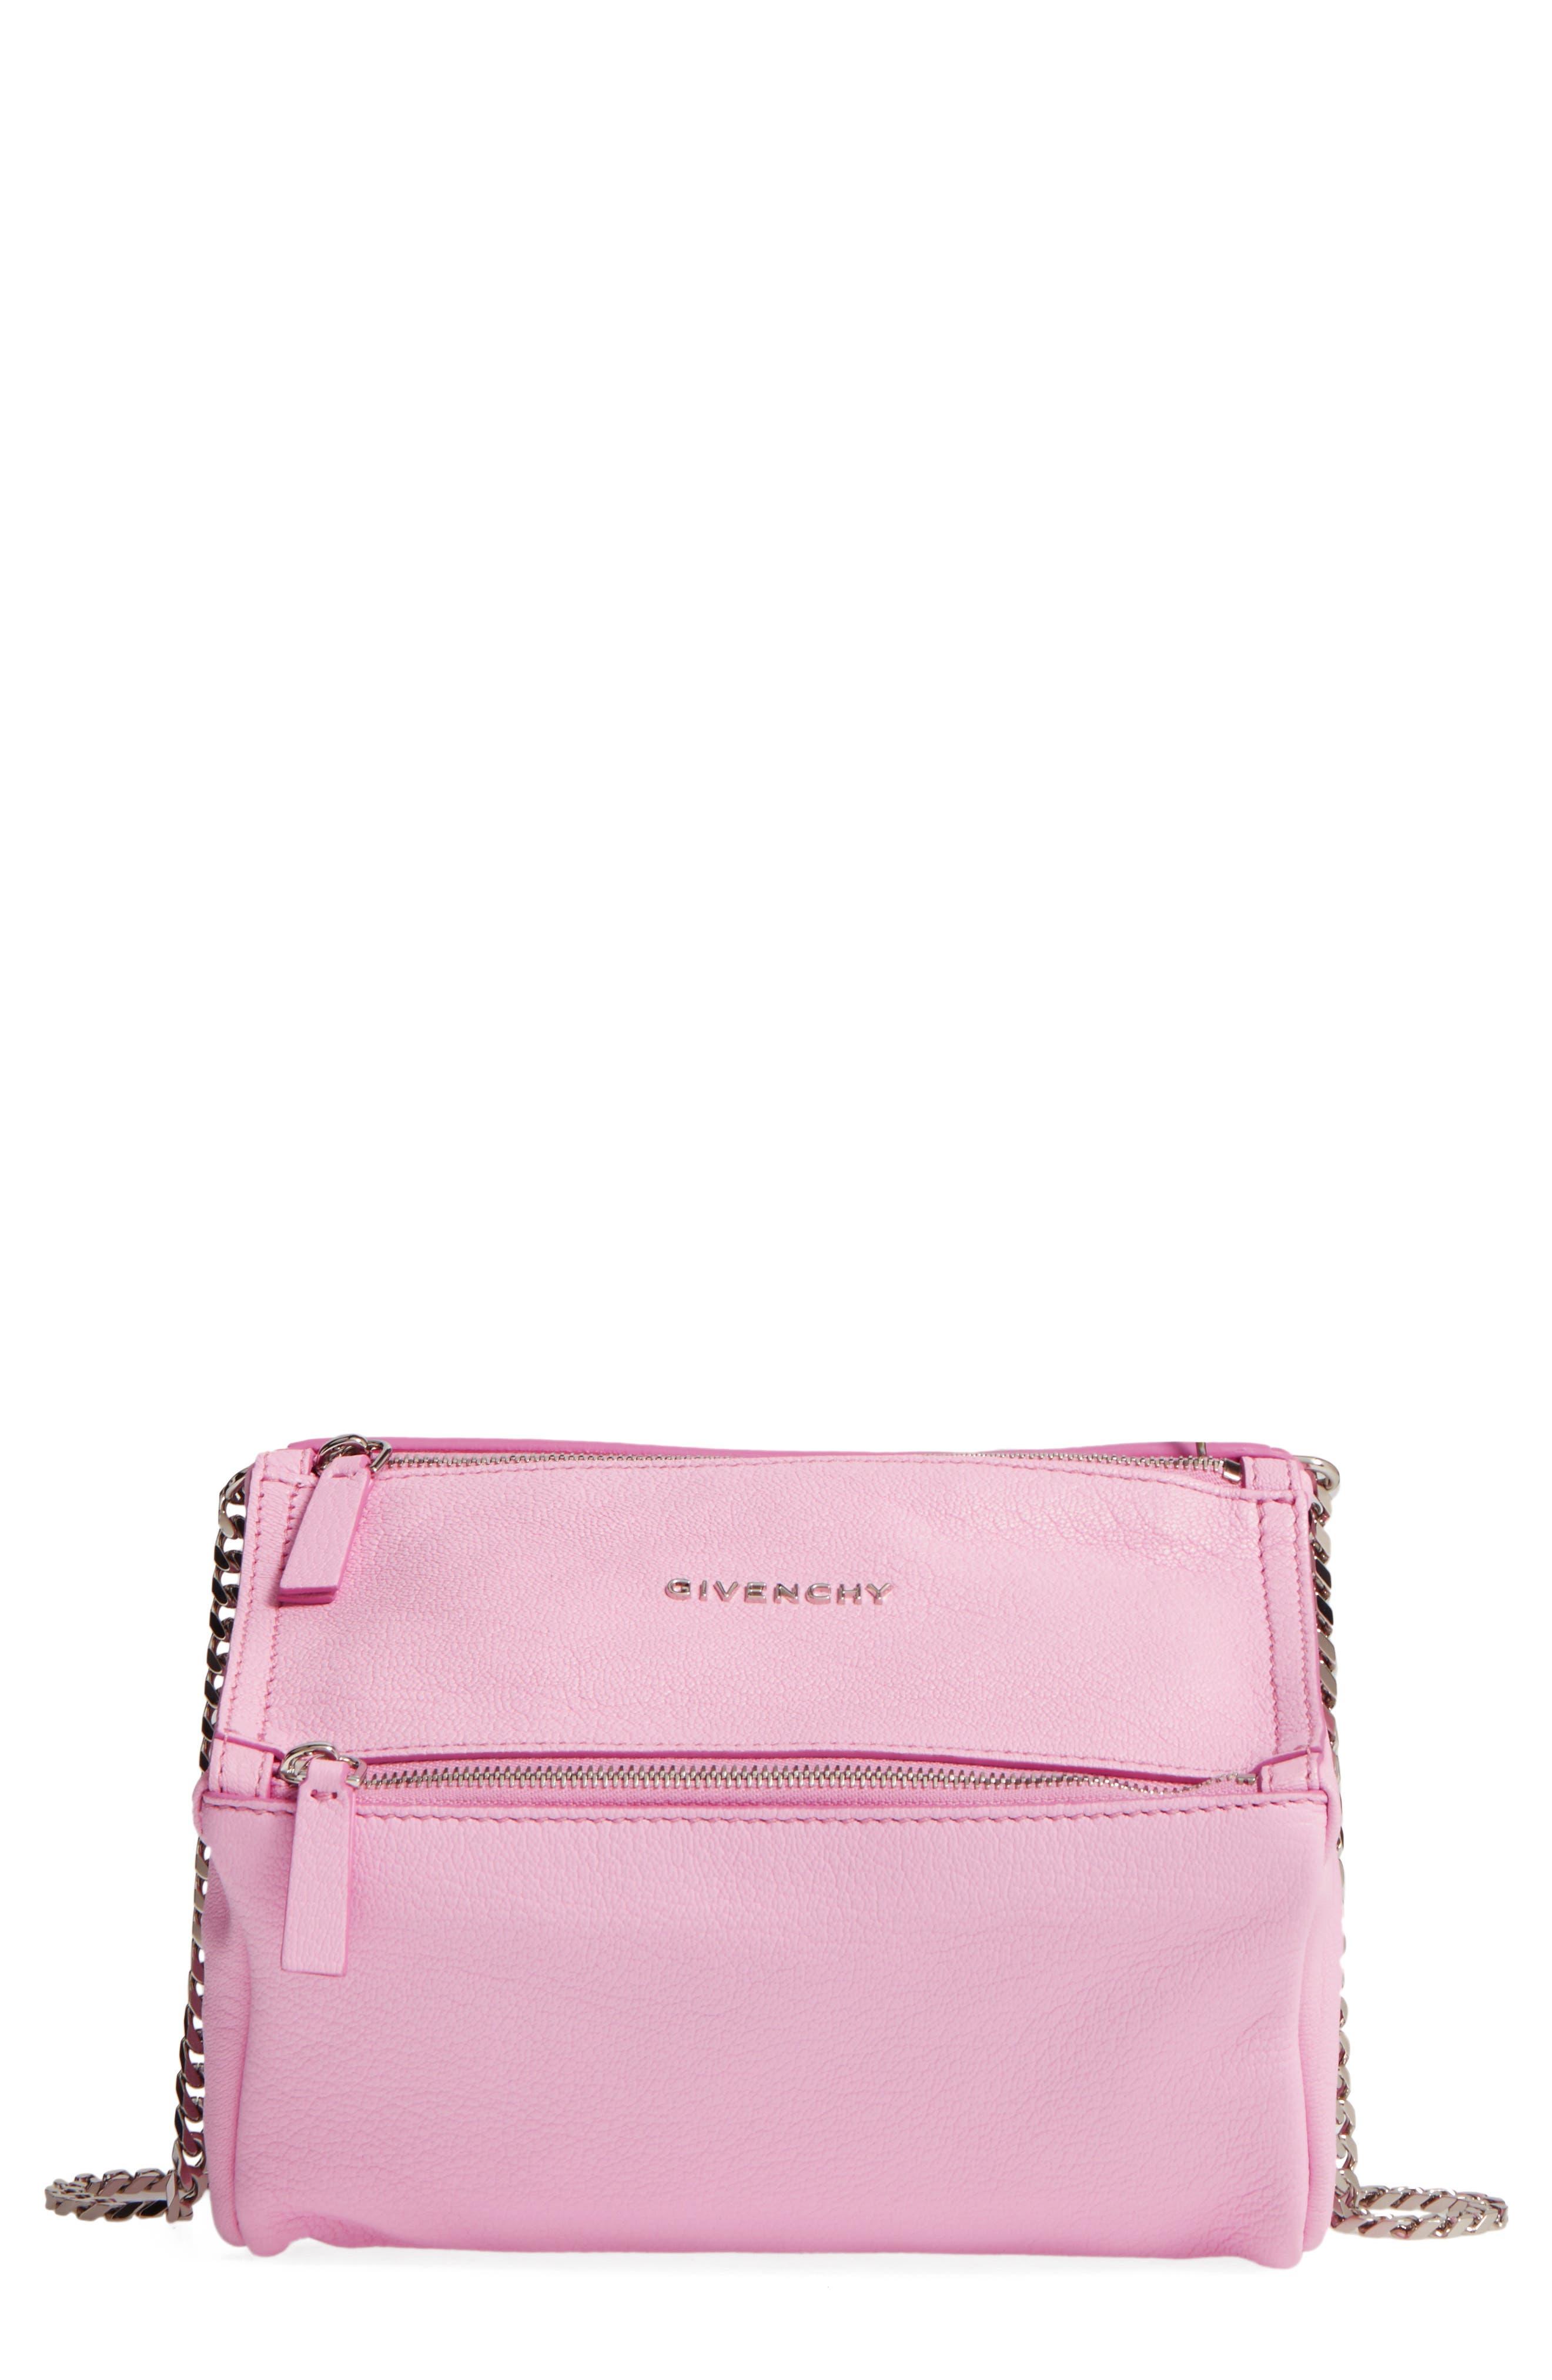 Main Image - Givenchy Mini Pandora Sugar Leather Shoulder Bag